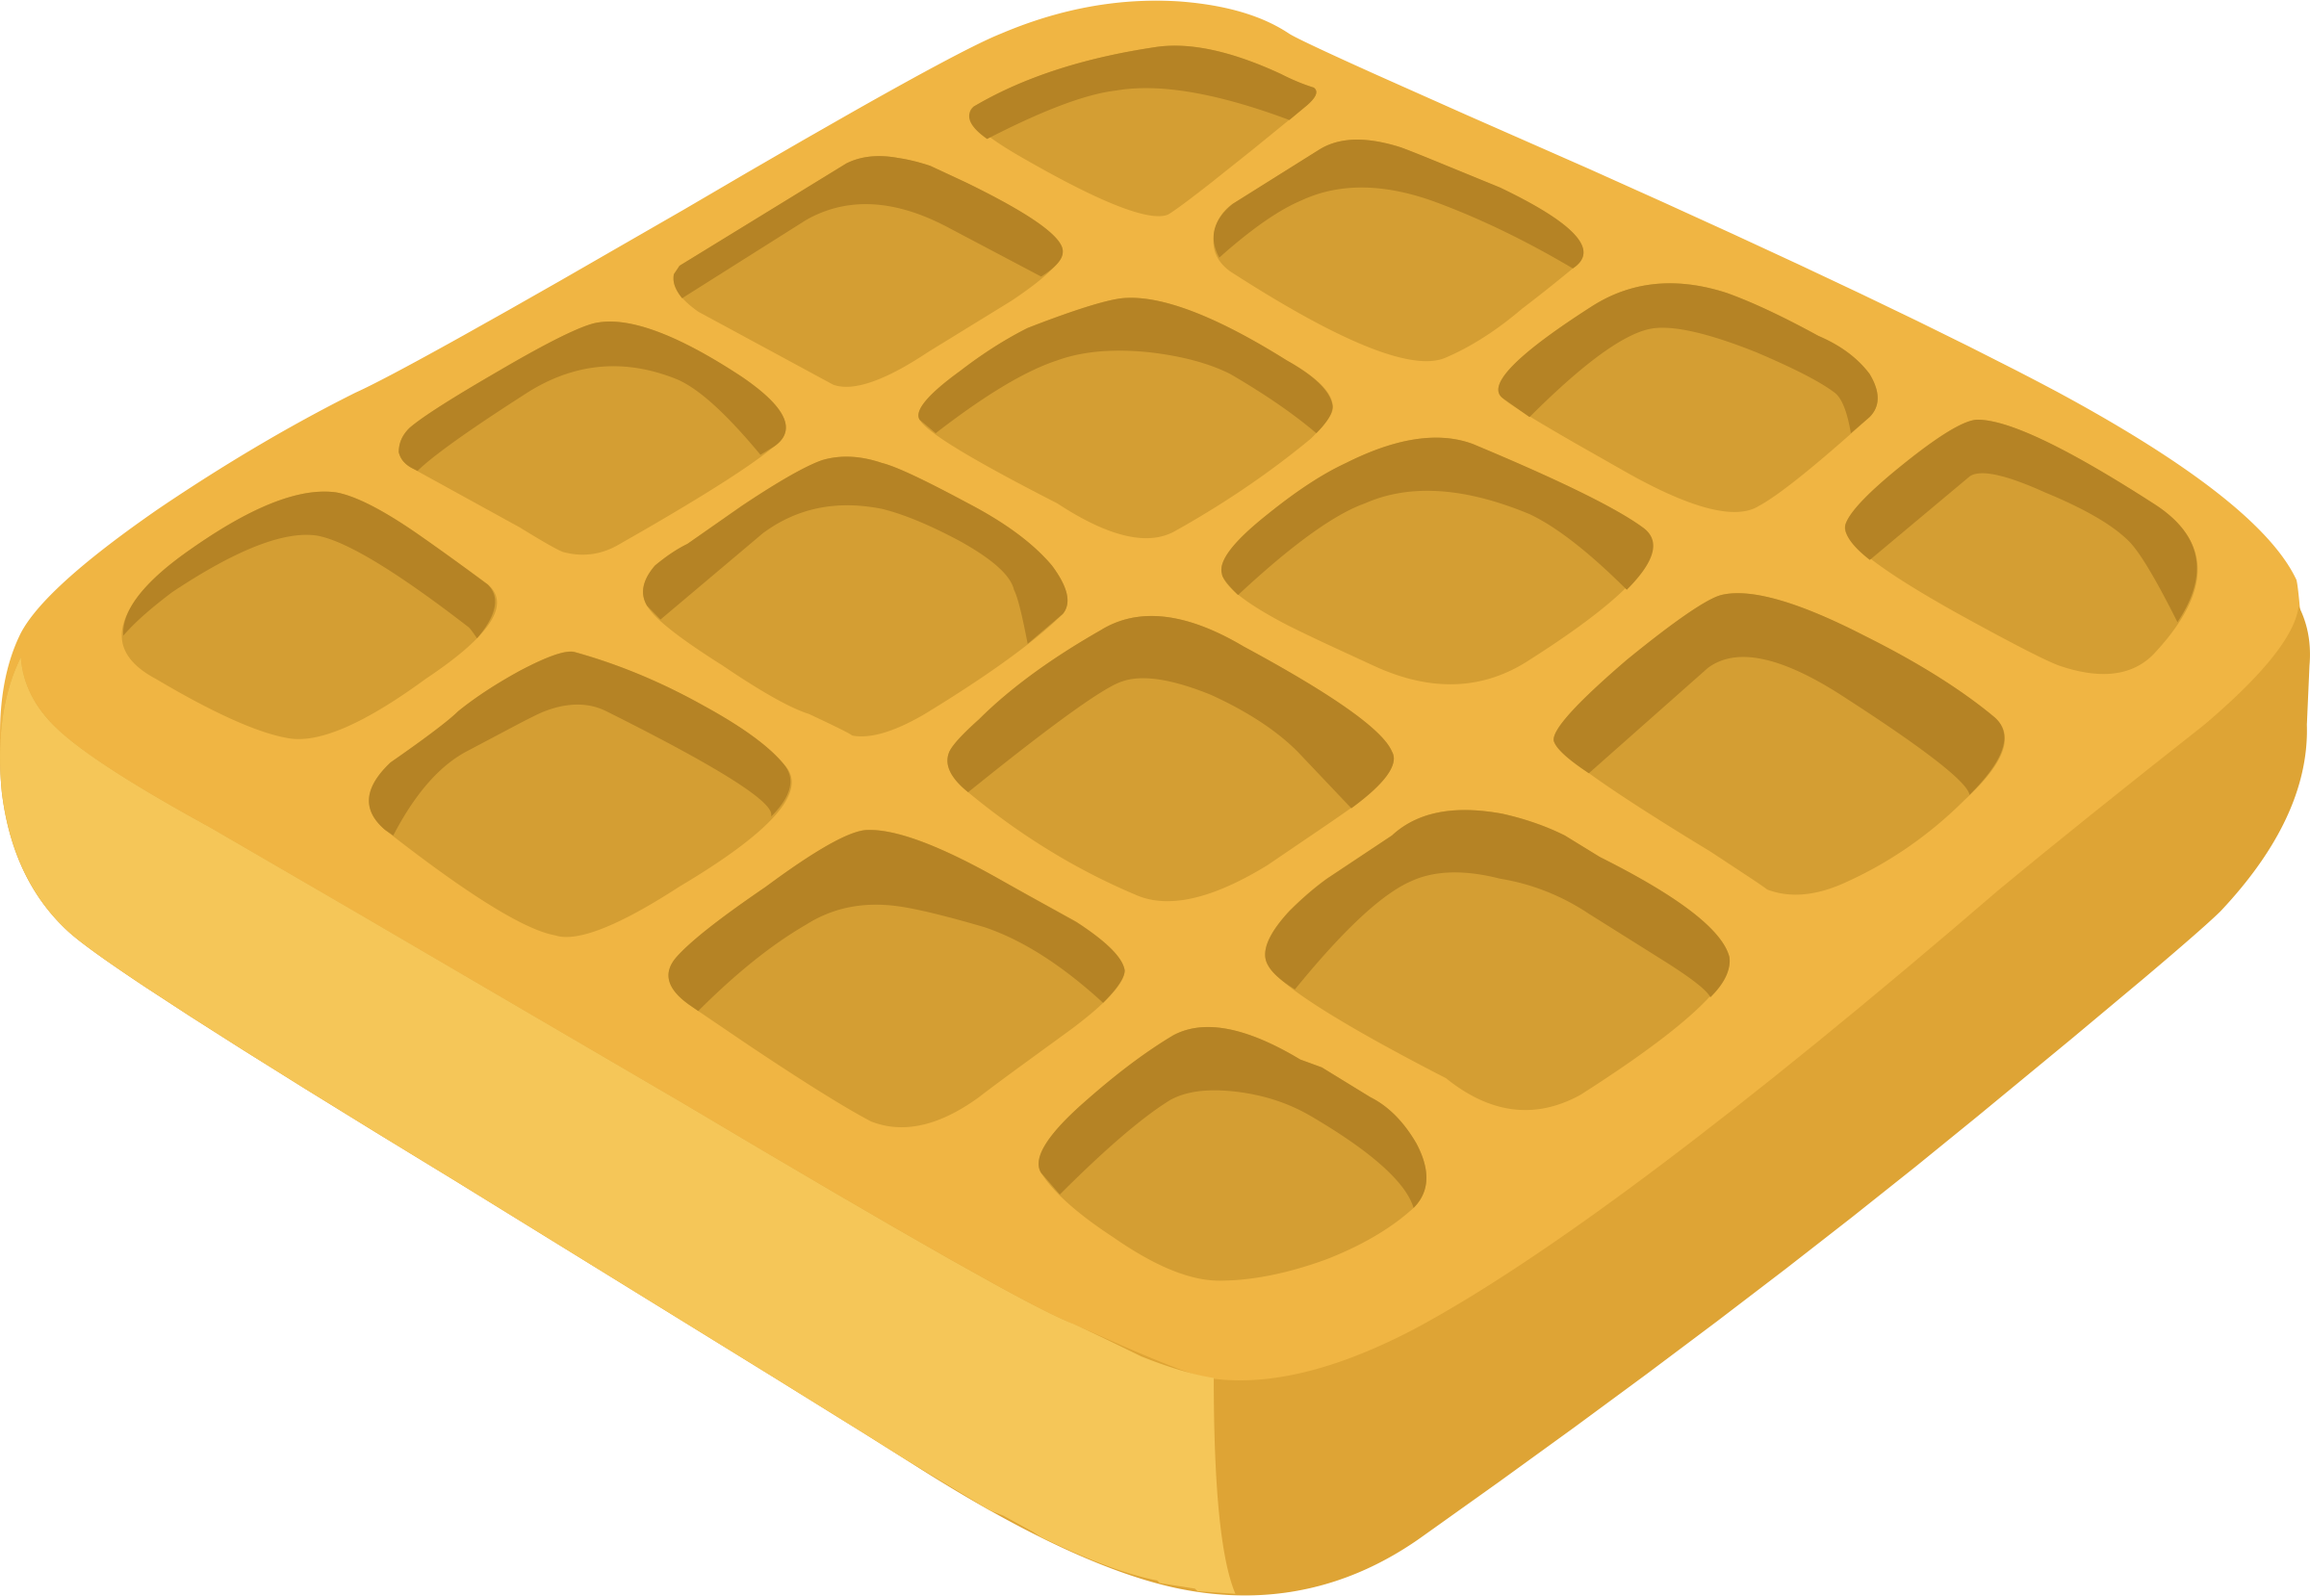 Waffle clipart svg. Food waffles by glitch